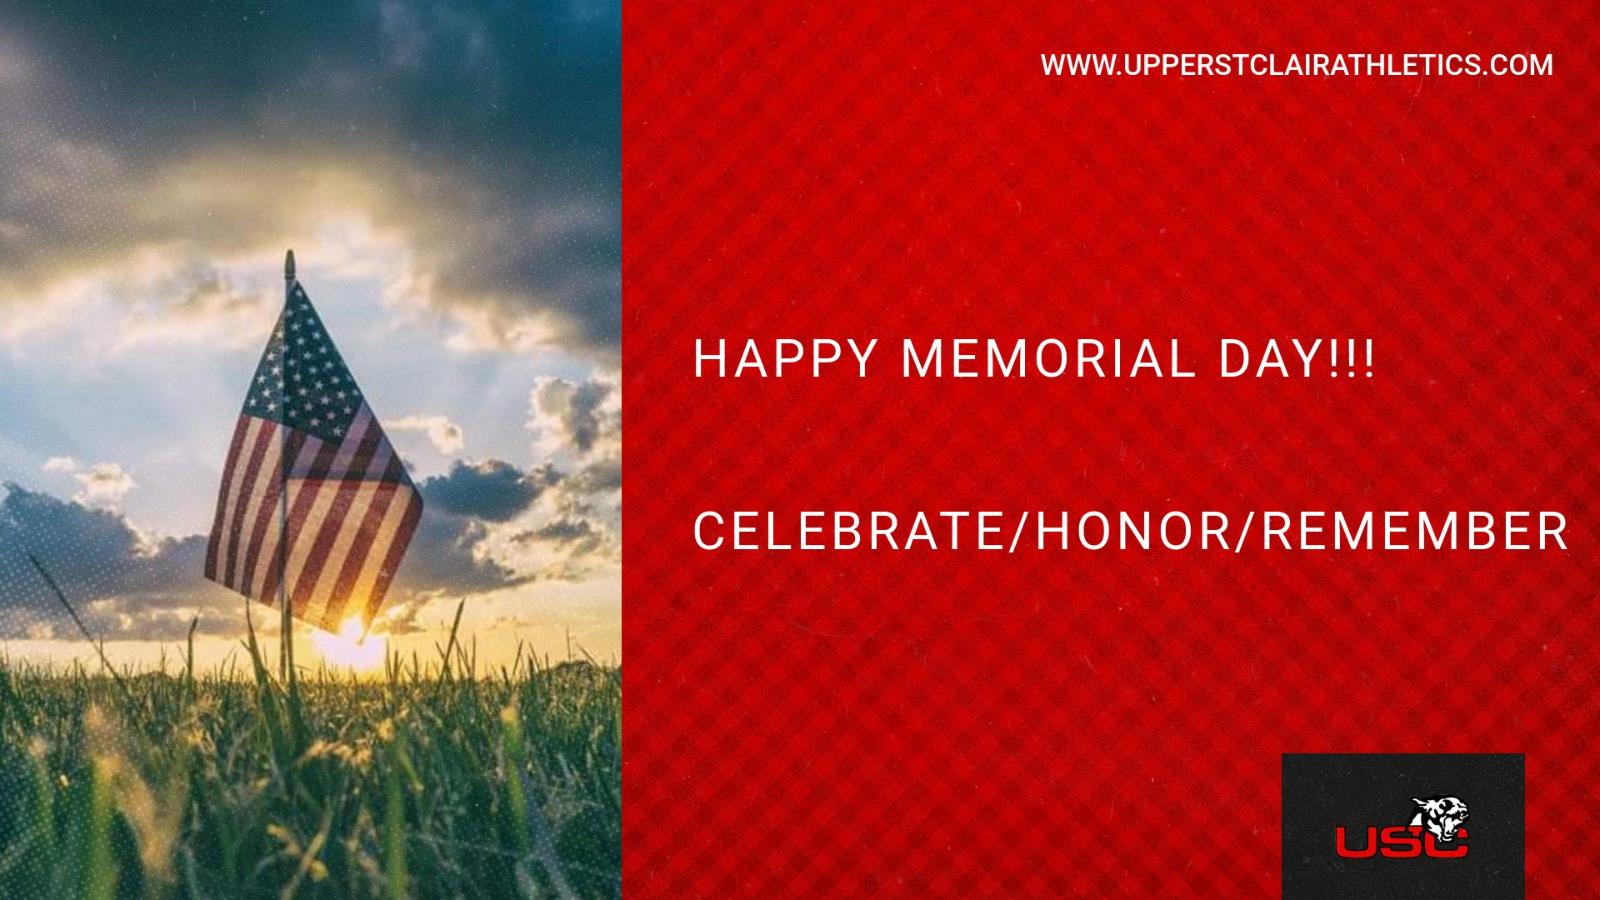 Happy Memorial Day!!!